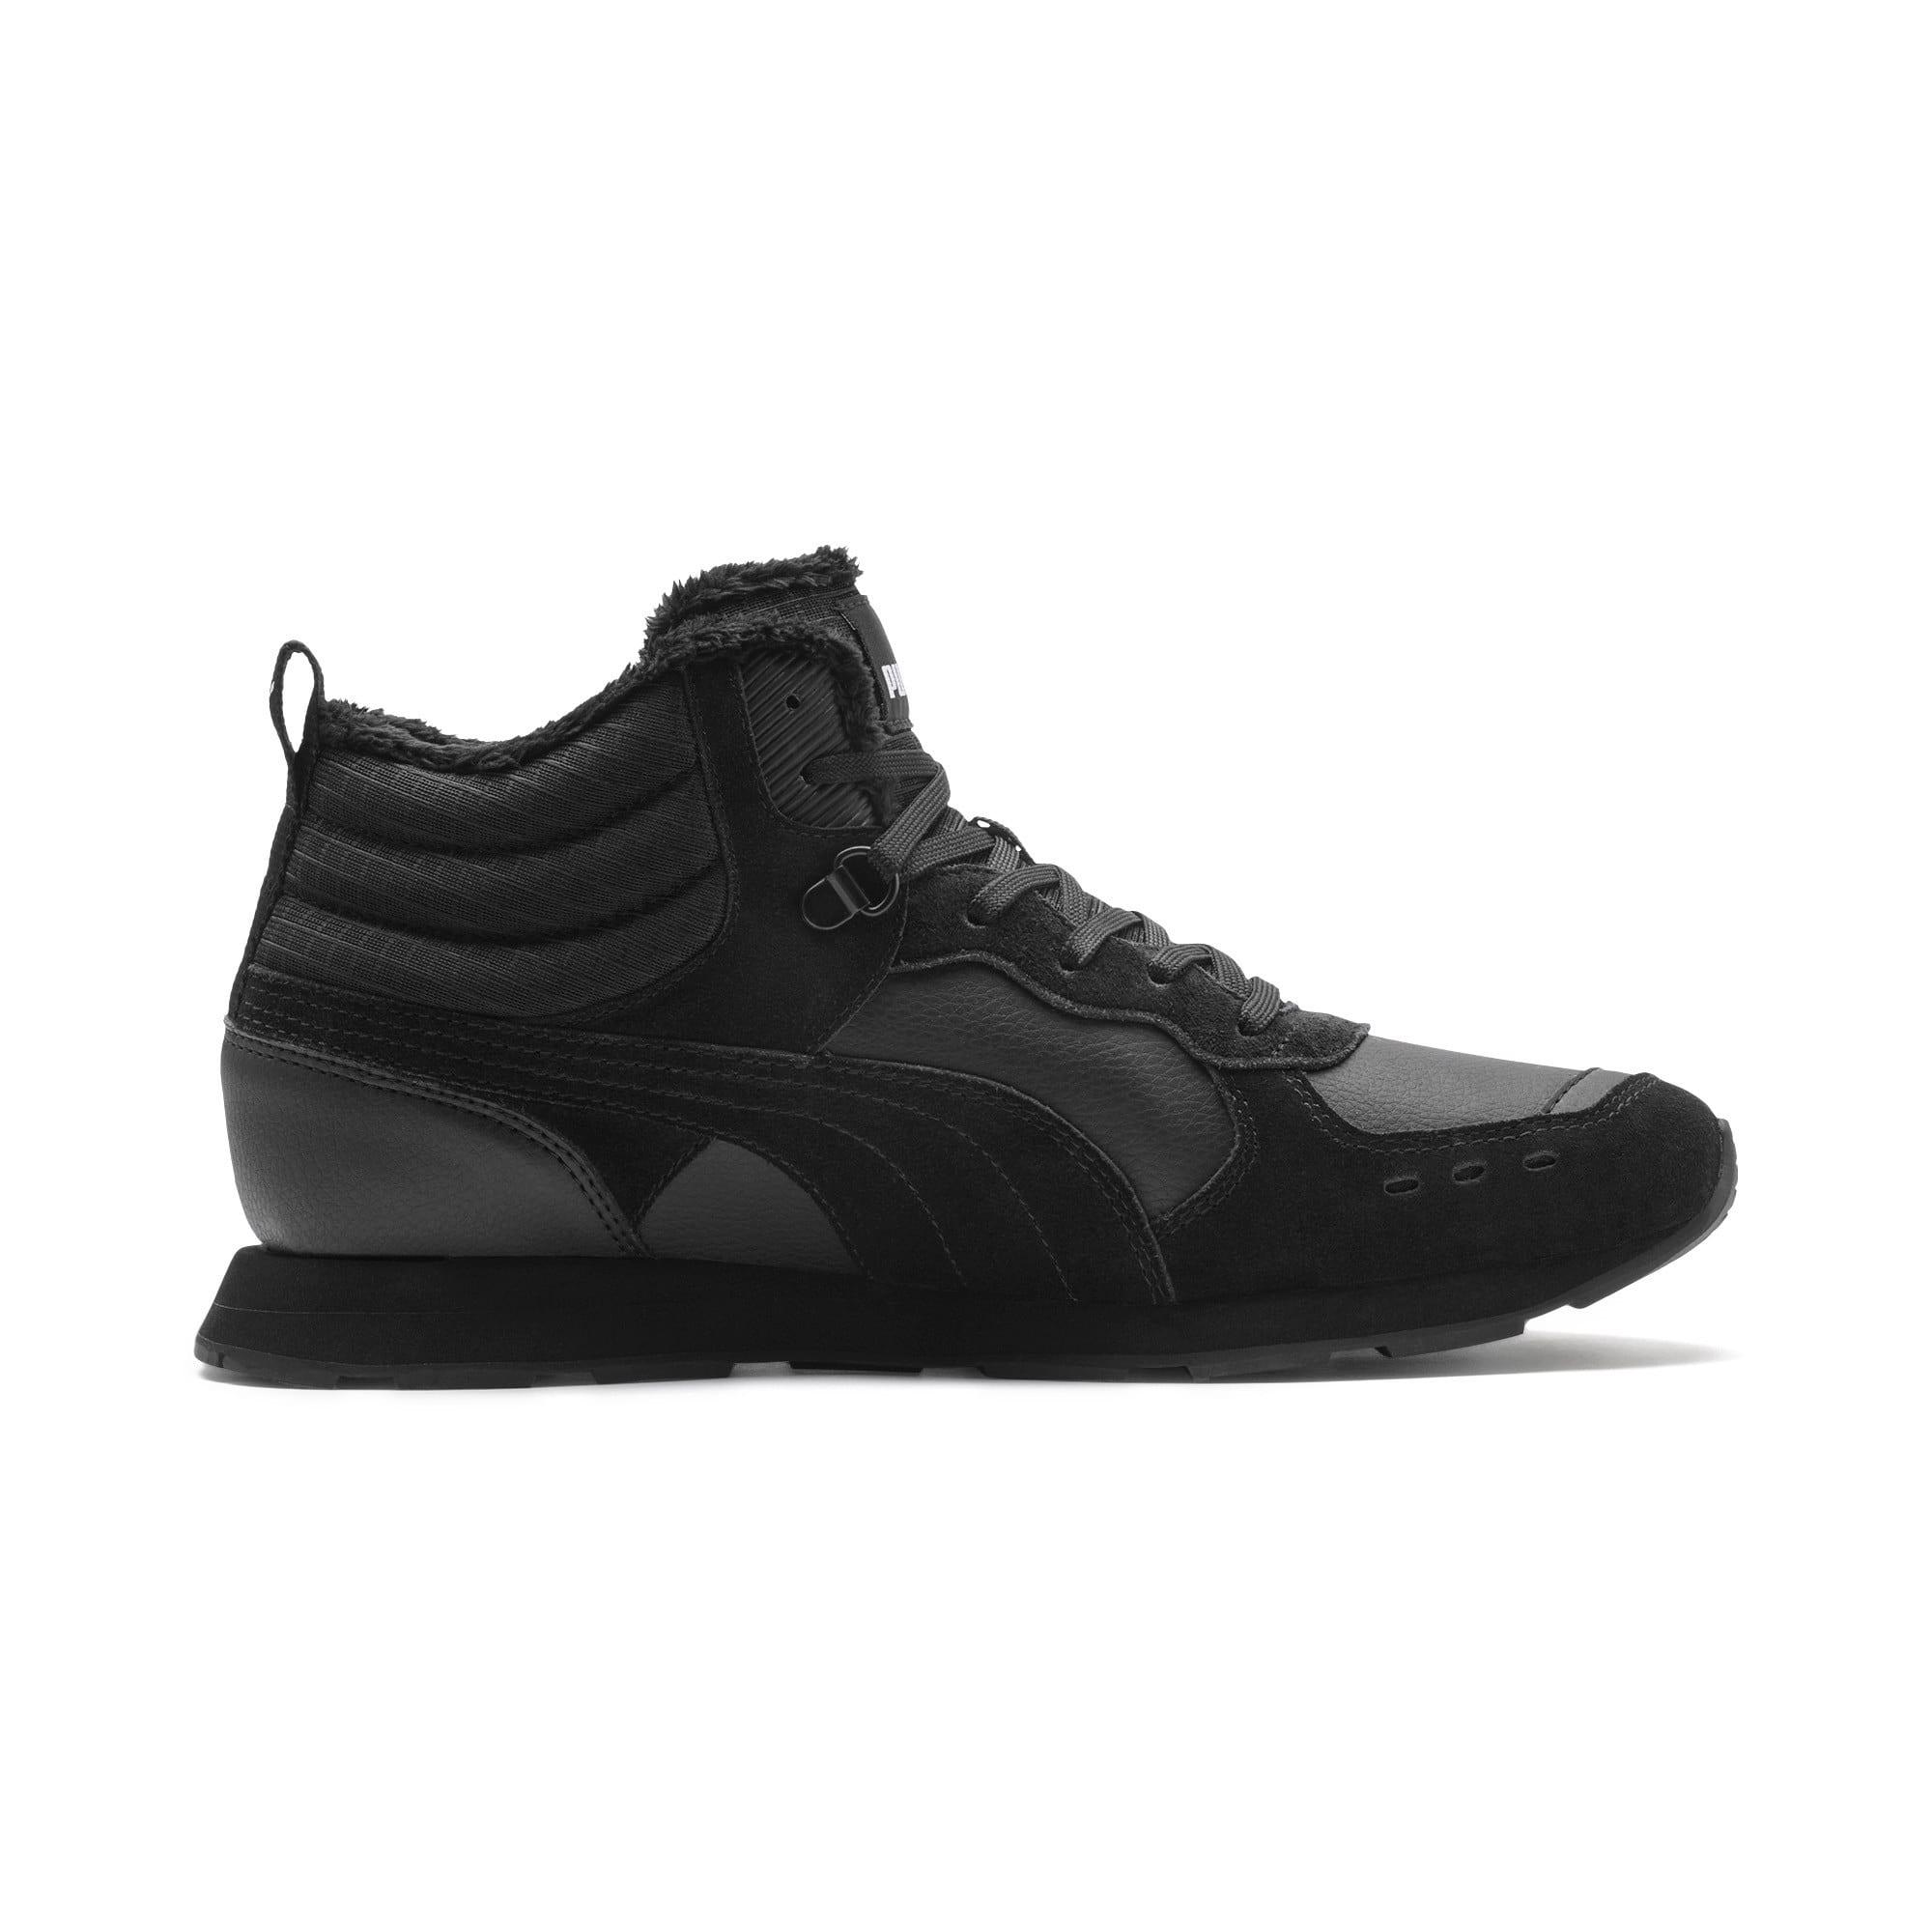 Anteprima 6 di Vista Mid-Cut Winter Running Shoes, Puma Black-Puma White, medio